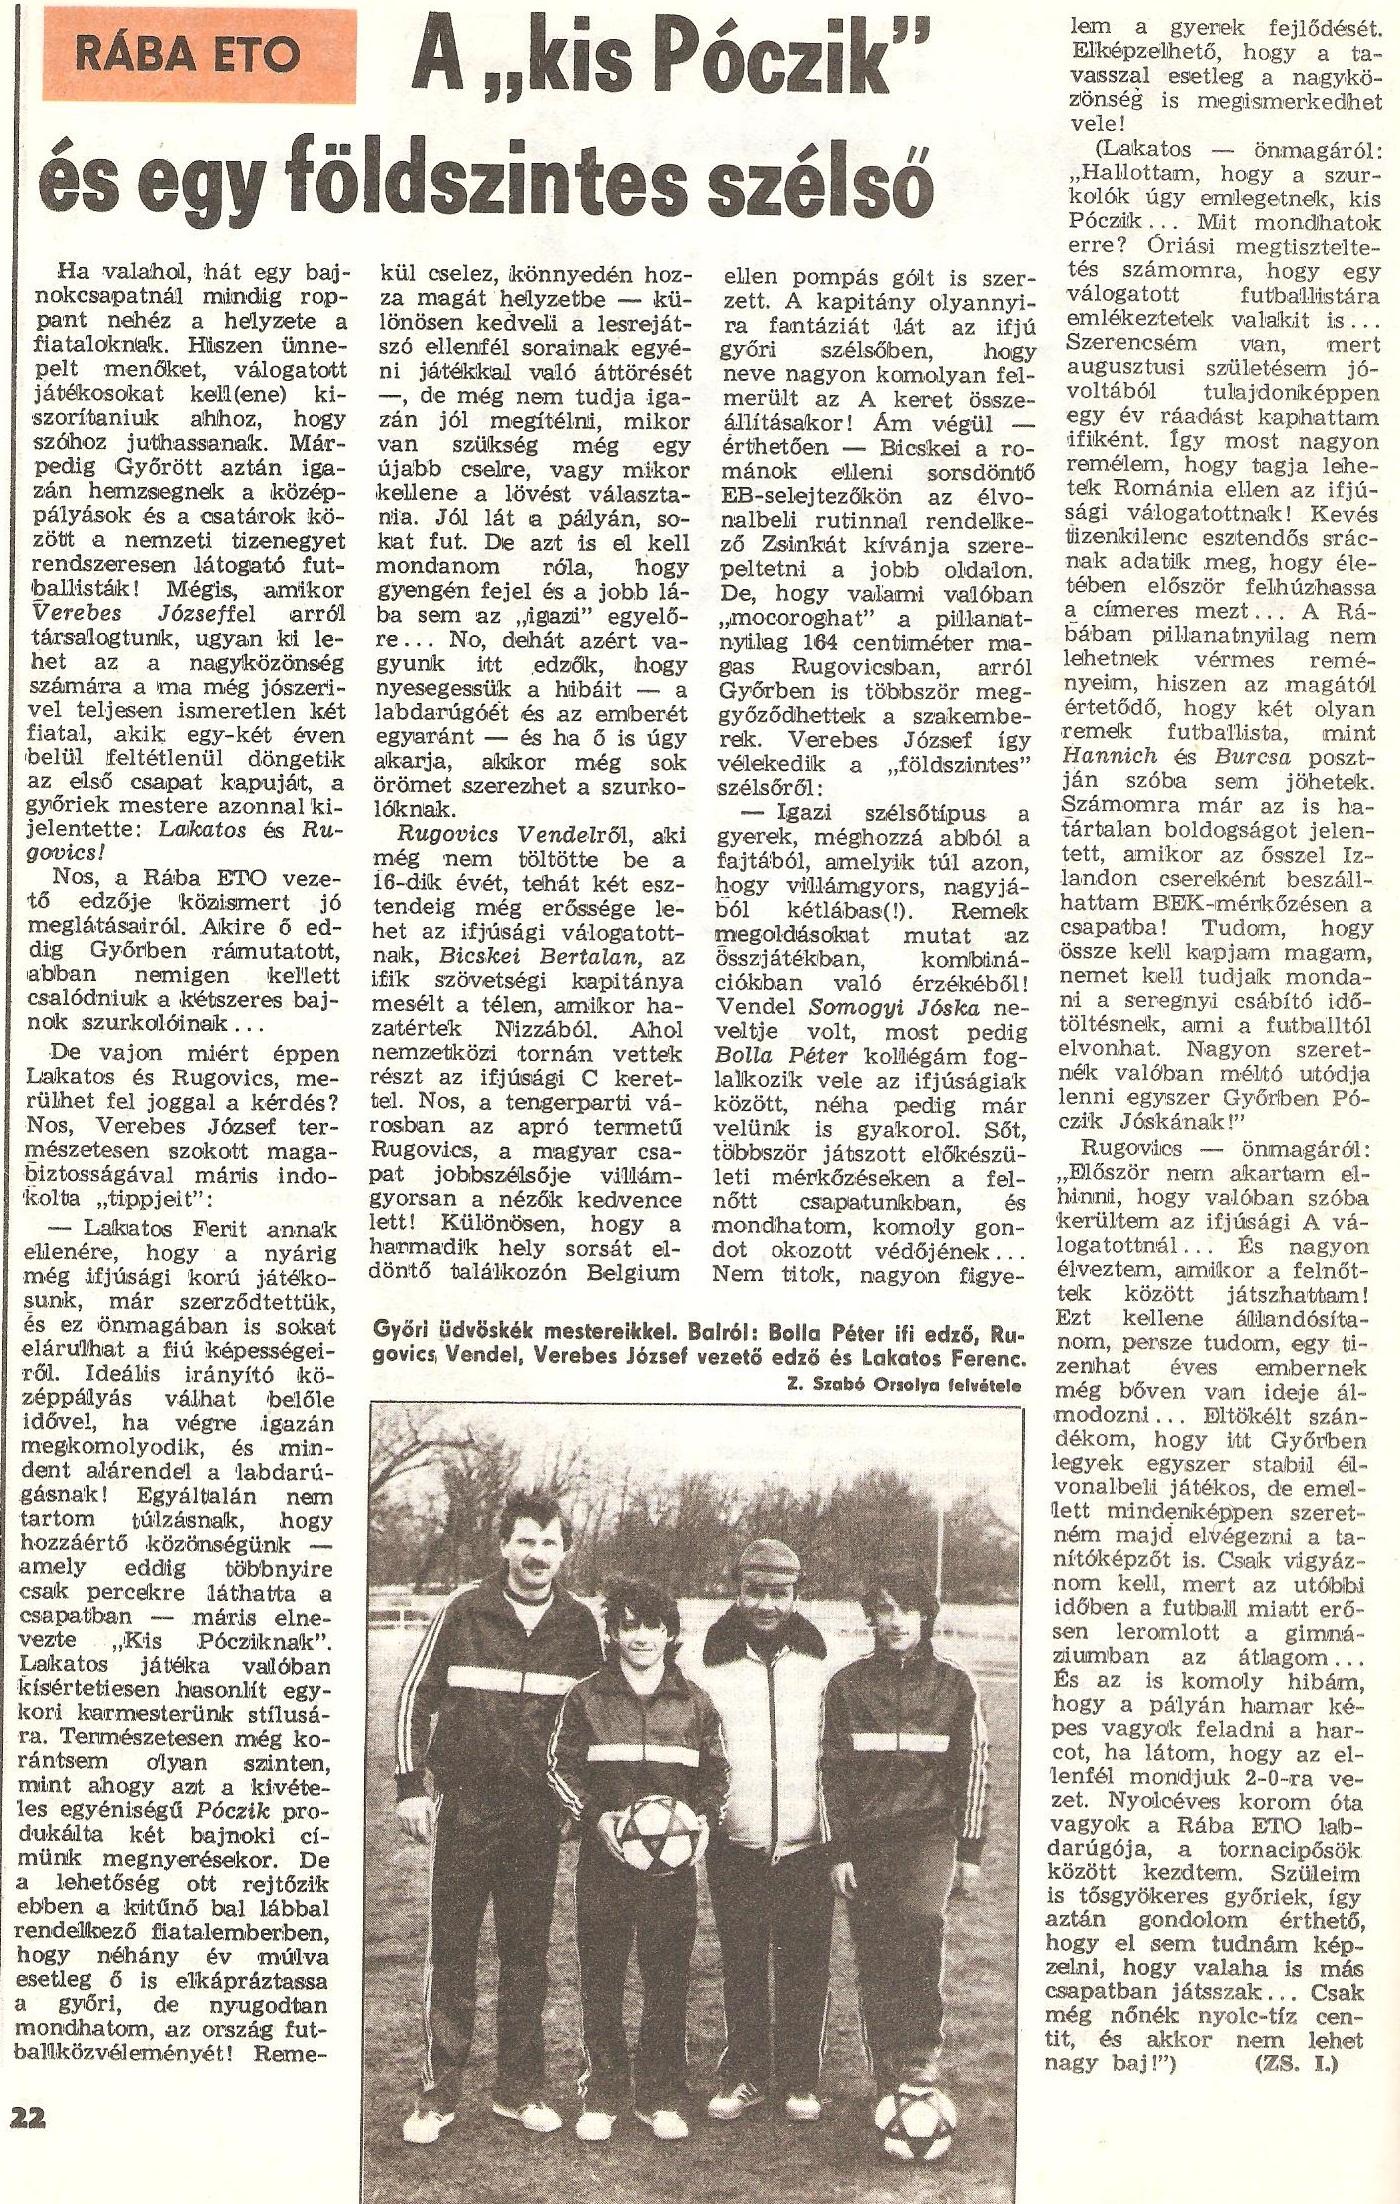 Idokapszula_1983-84_Teliszunet_bevetes_elott_Raba_ETO.jpg